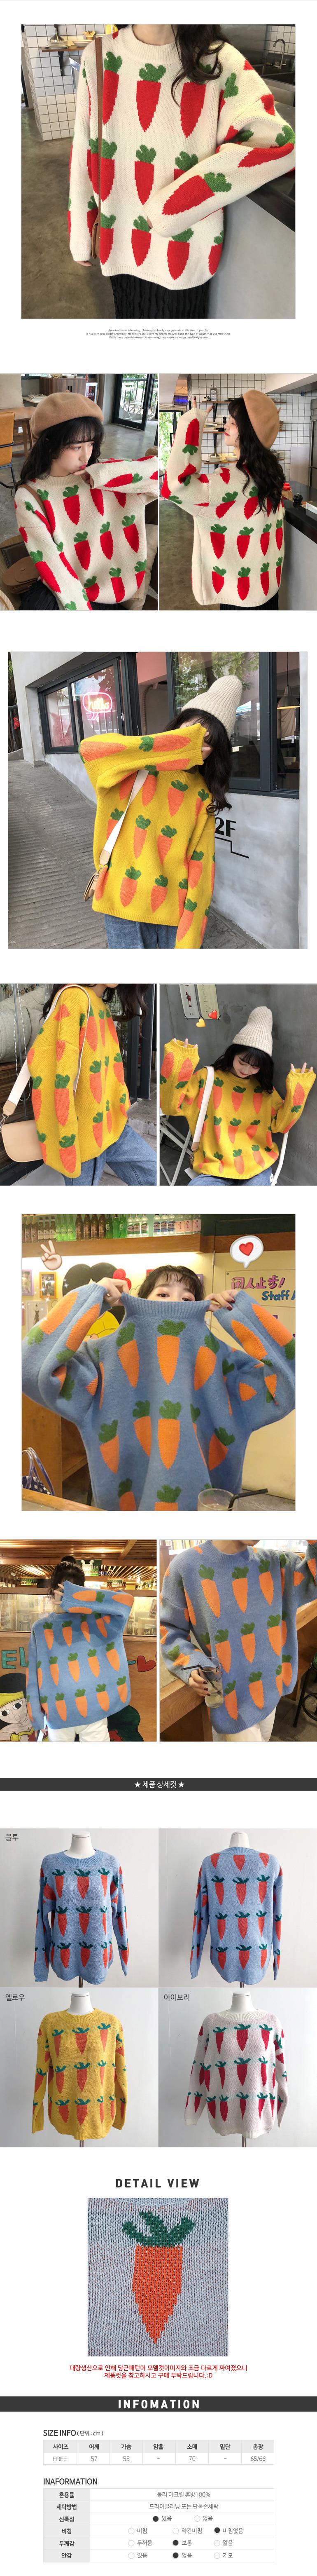 Carat knit